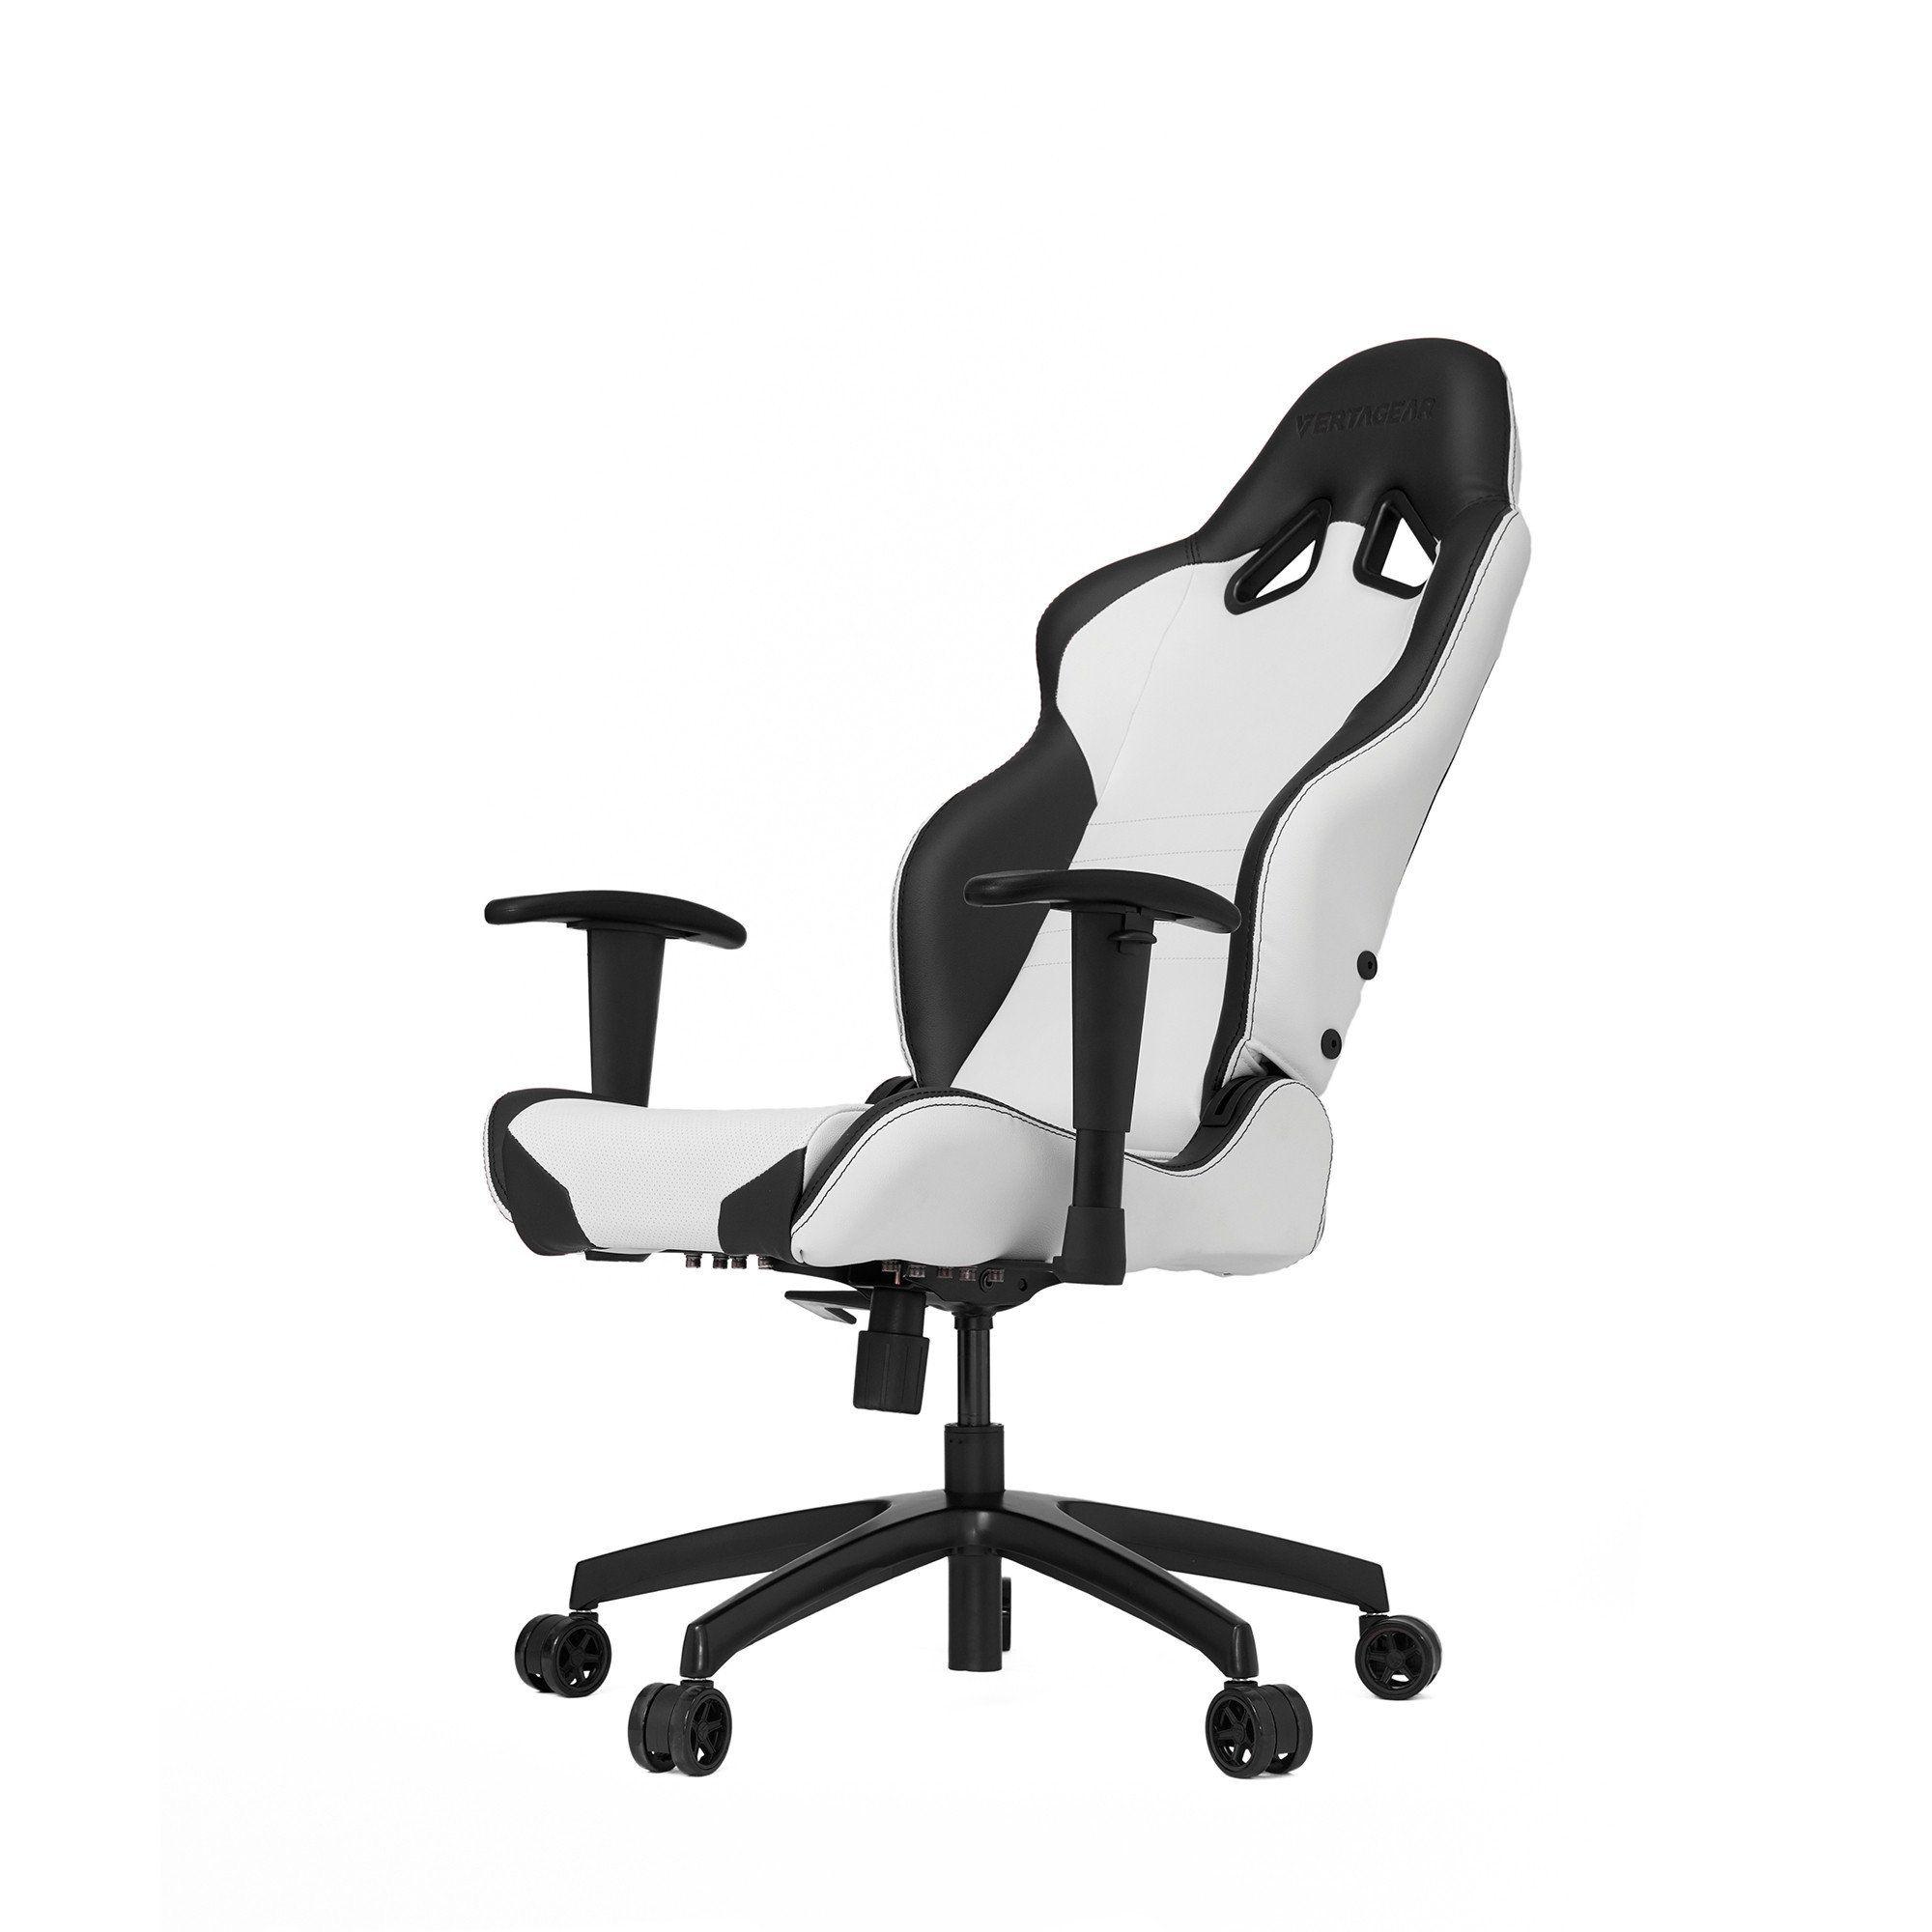 Cadeira Gamer Vertagear Series Racing S-LINE SL2000 Branca e Preta - VG-SL2000_WBK